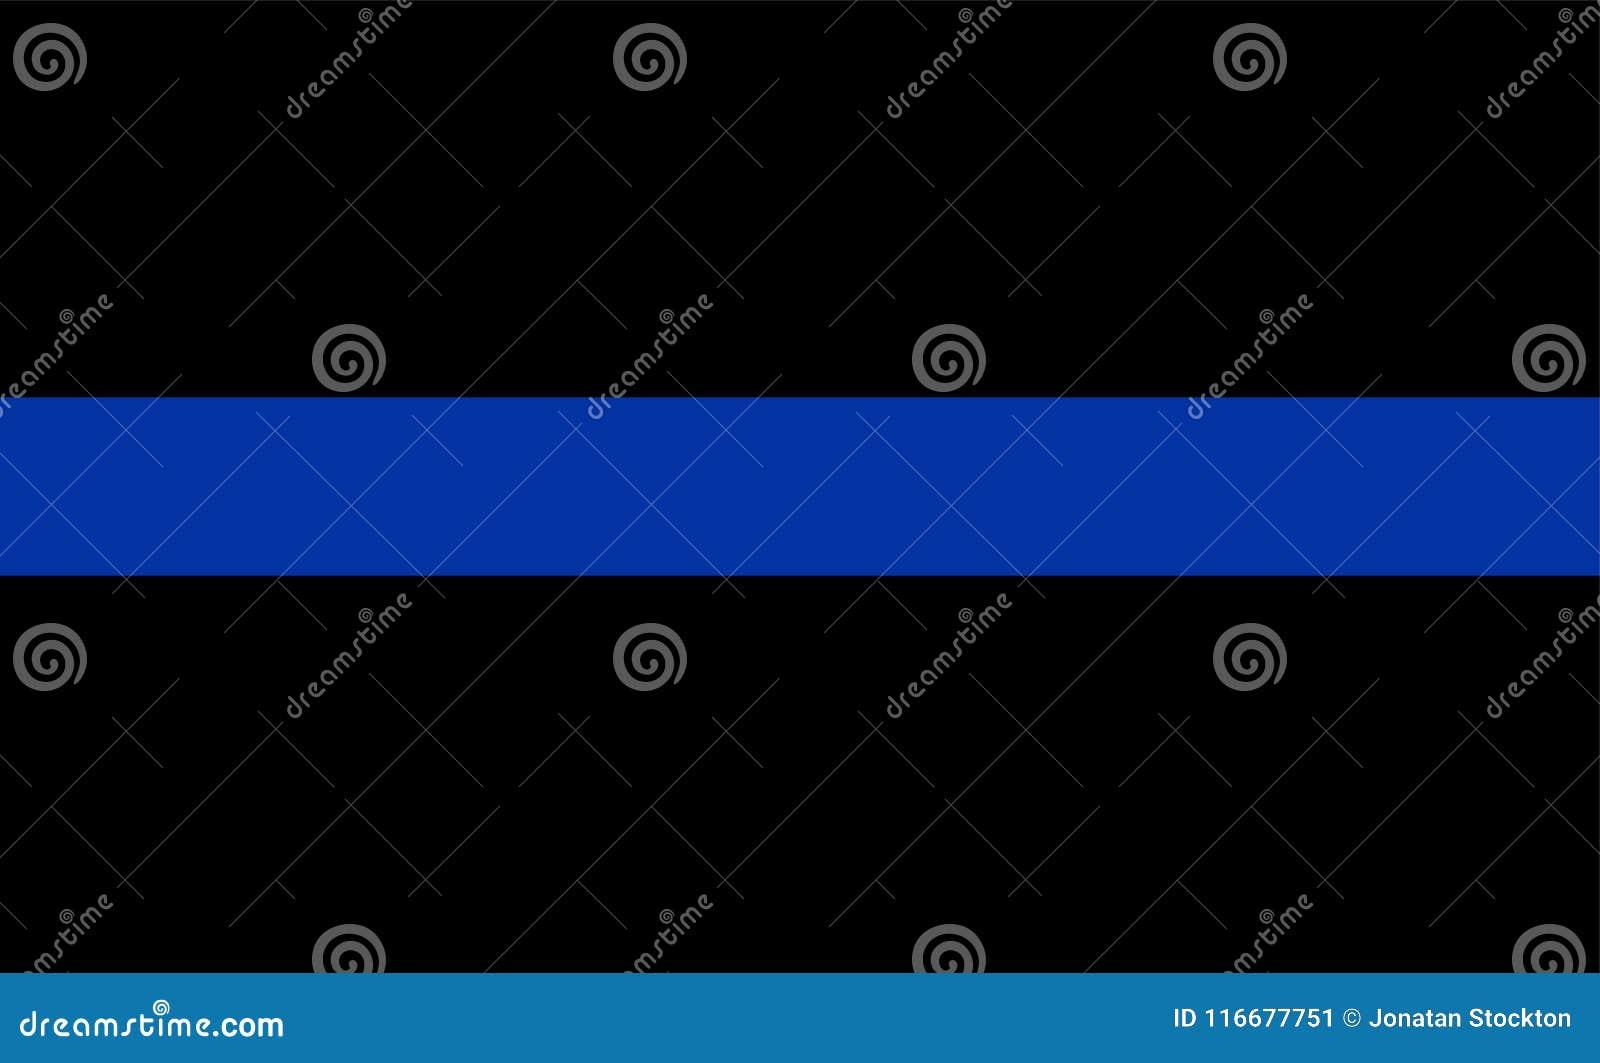 Thin Blue Line Flag Law Enforcement Symbol American Police Flag